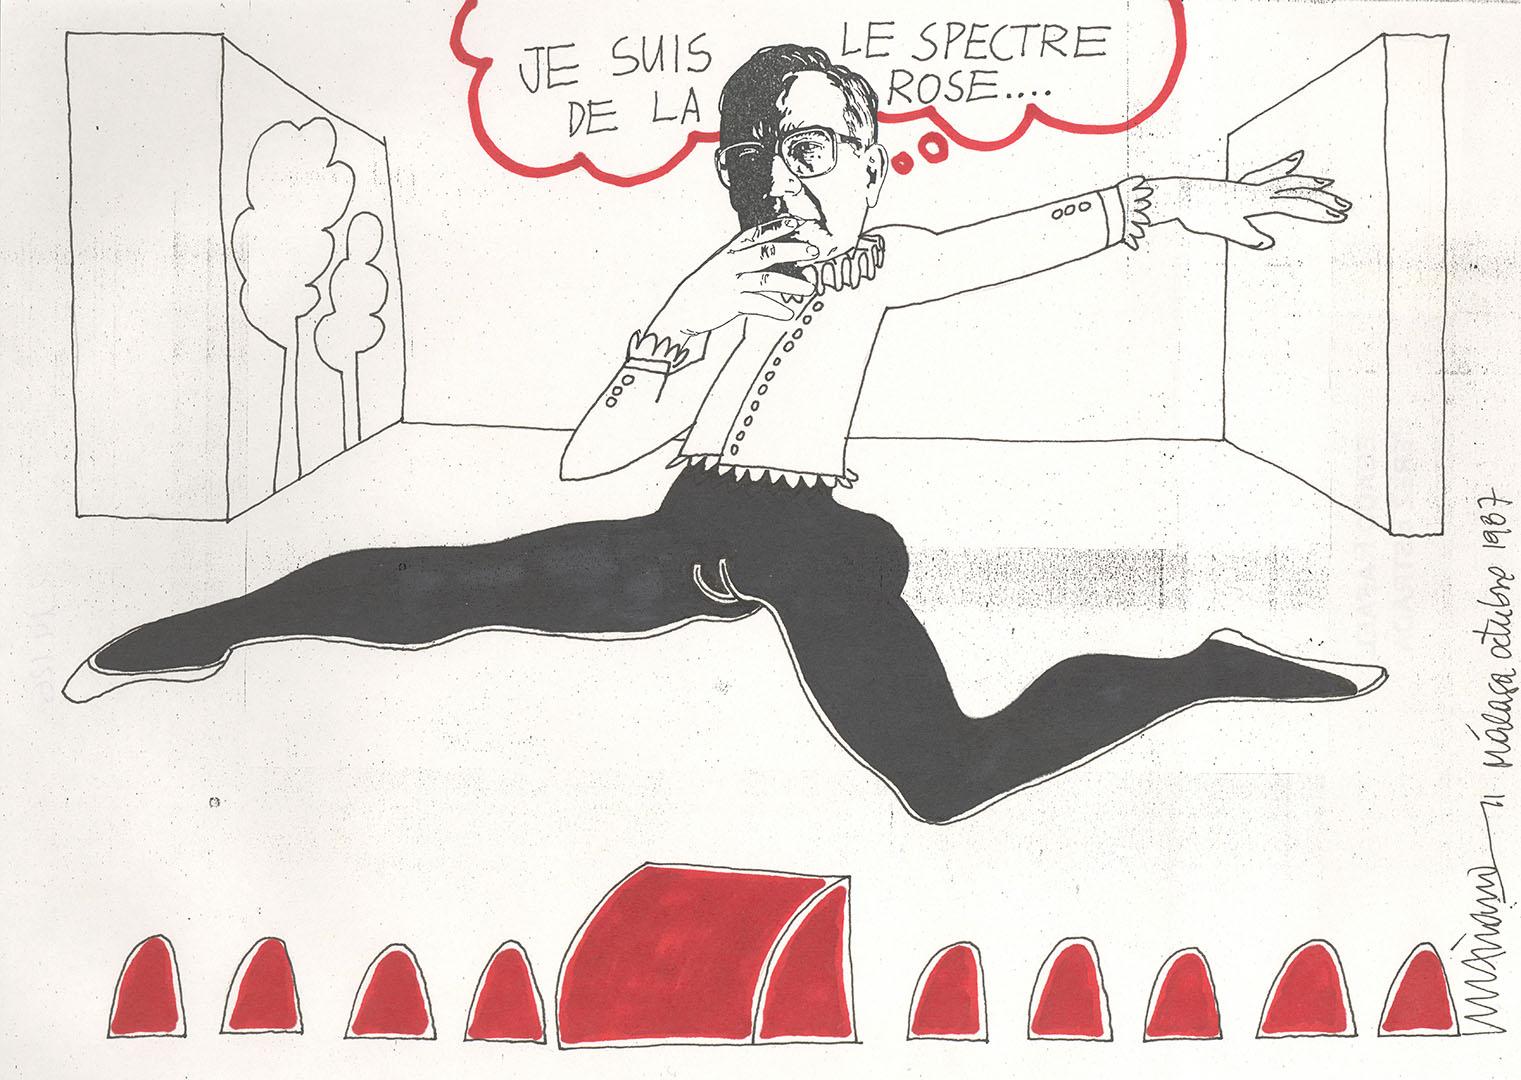 1987 - Dibujo de un bailarin con la cara de Rafael Pérez Estrada<div style='clear:both;width:100%;height:0px;'></div><span class='cat'>Dibujos, Drawings</span>